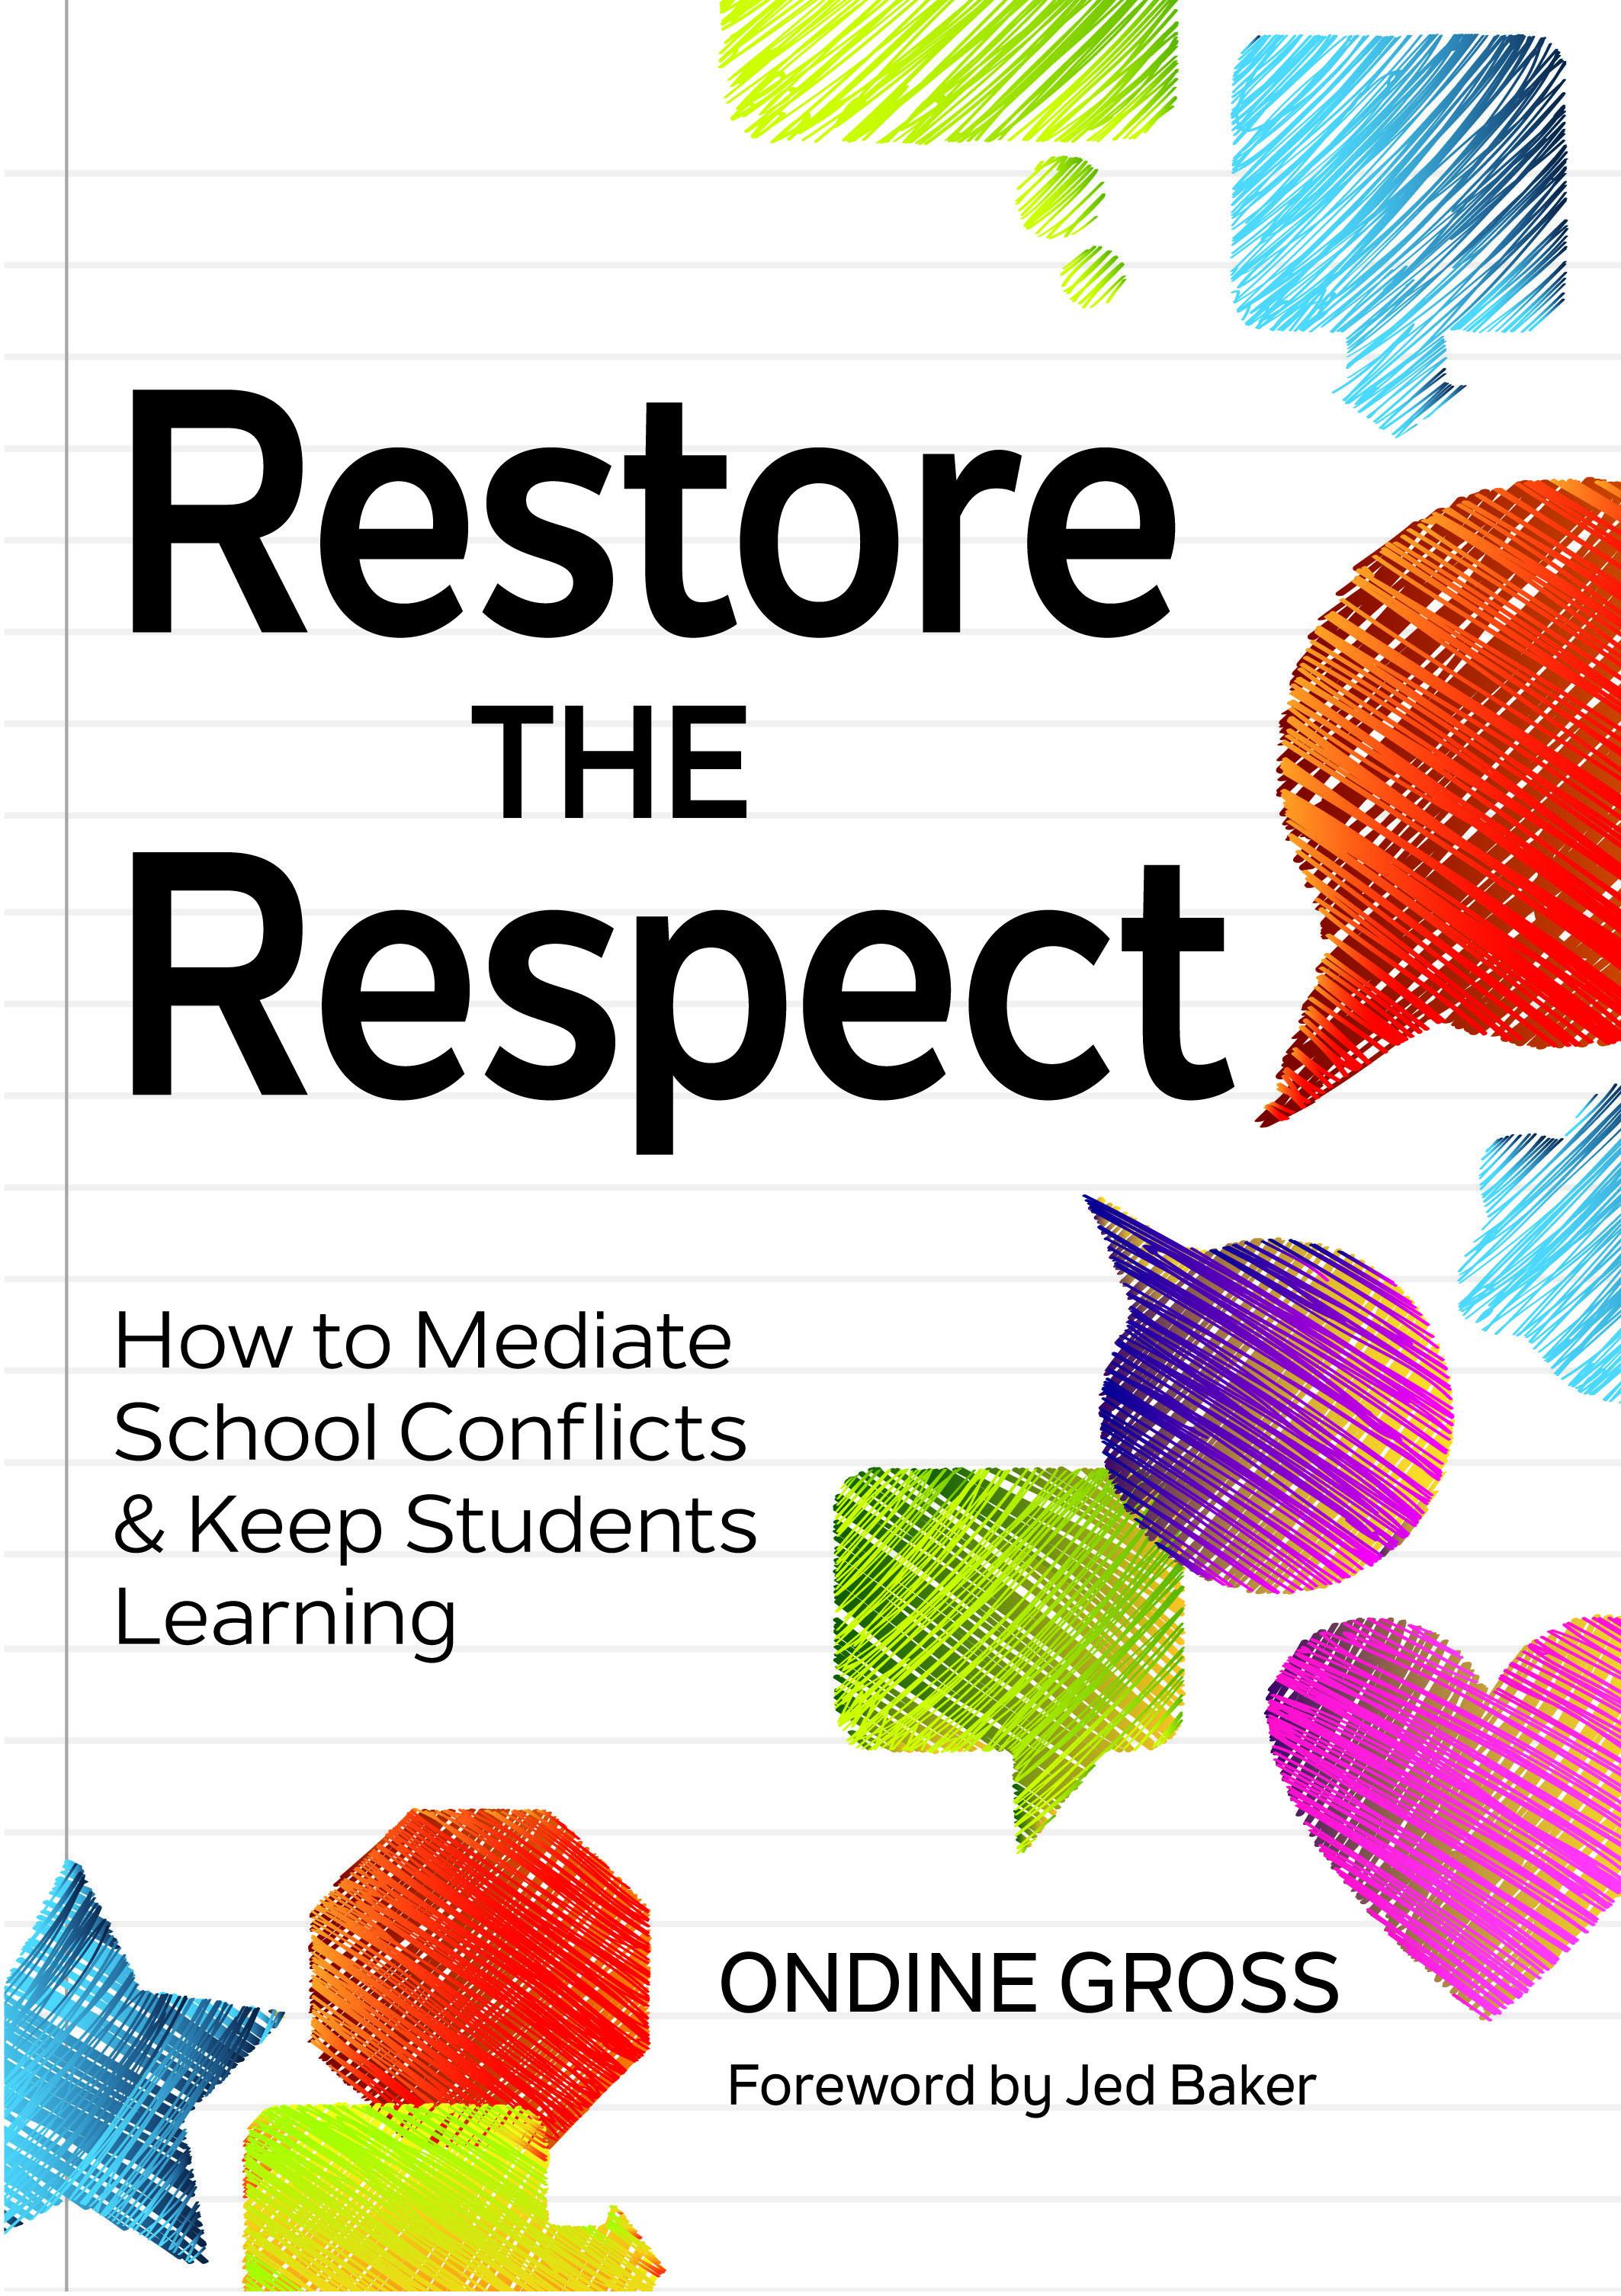 restore the respect ondine gross book cover